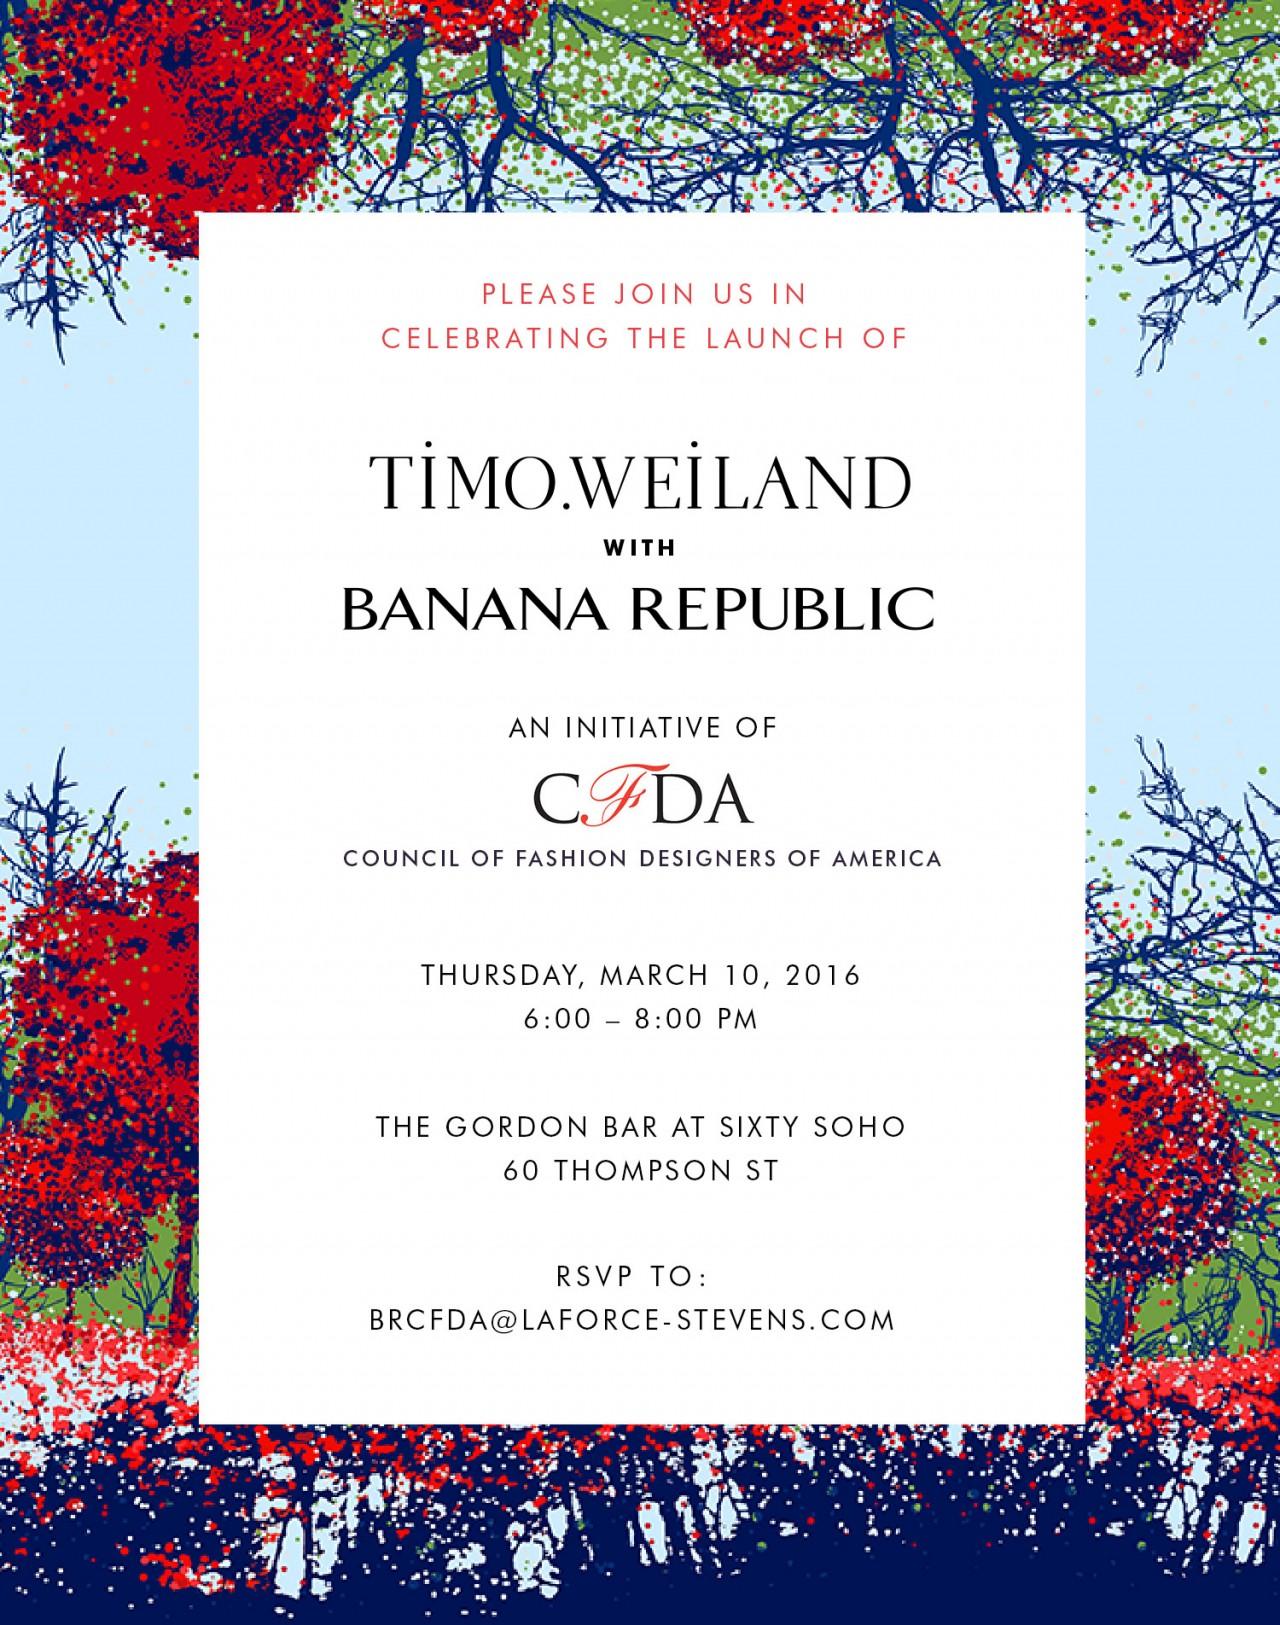 ALEXANDER ABRIAM — TIMO WEILAND X BANANA REPUBLIC INVITATION